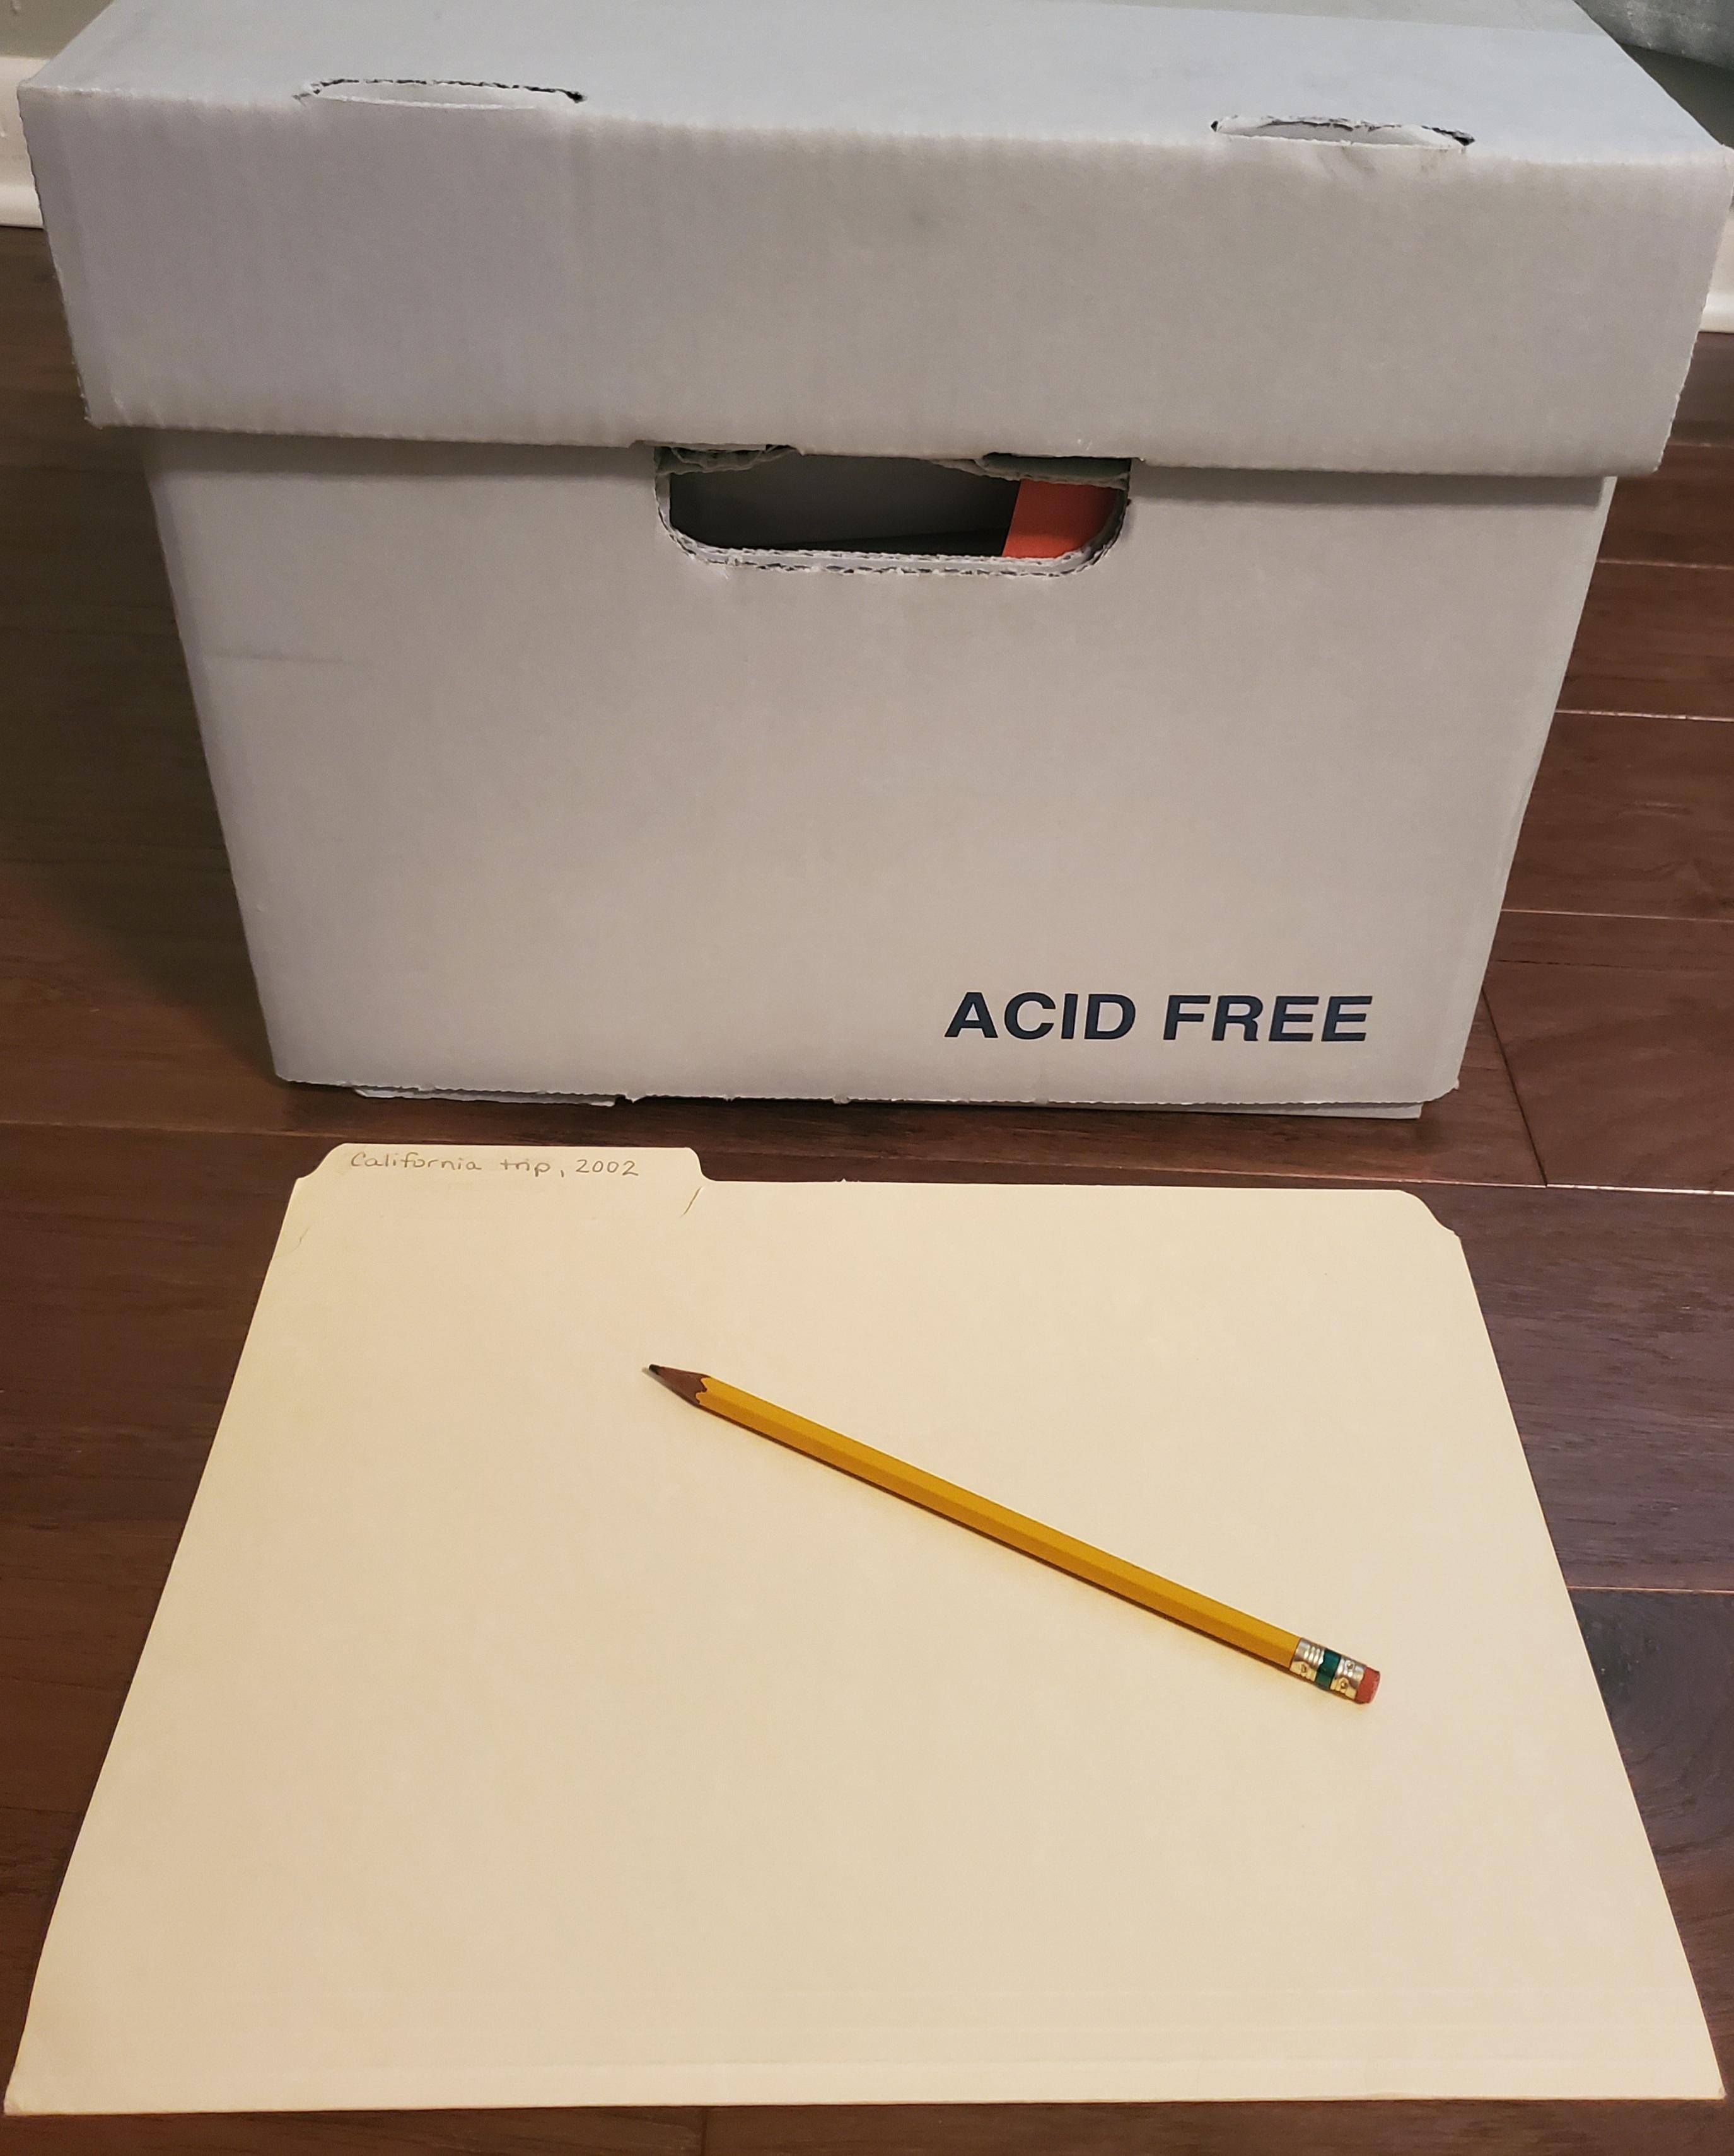 Acid free box, folder, and pencil